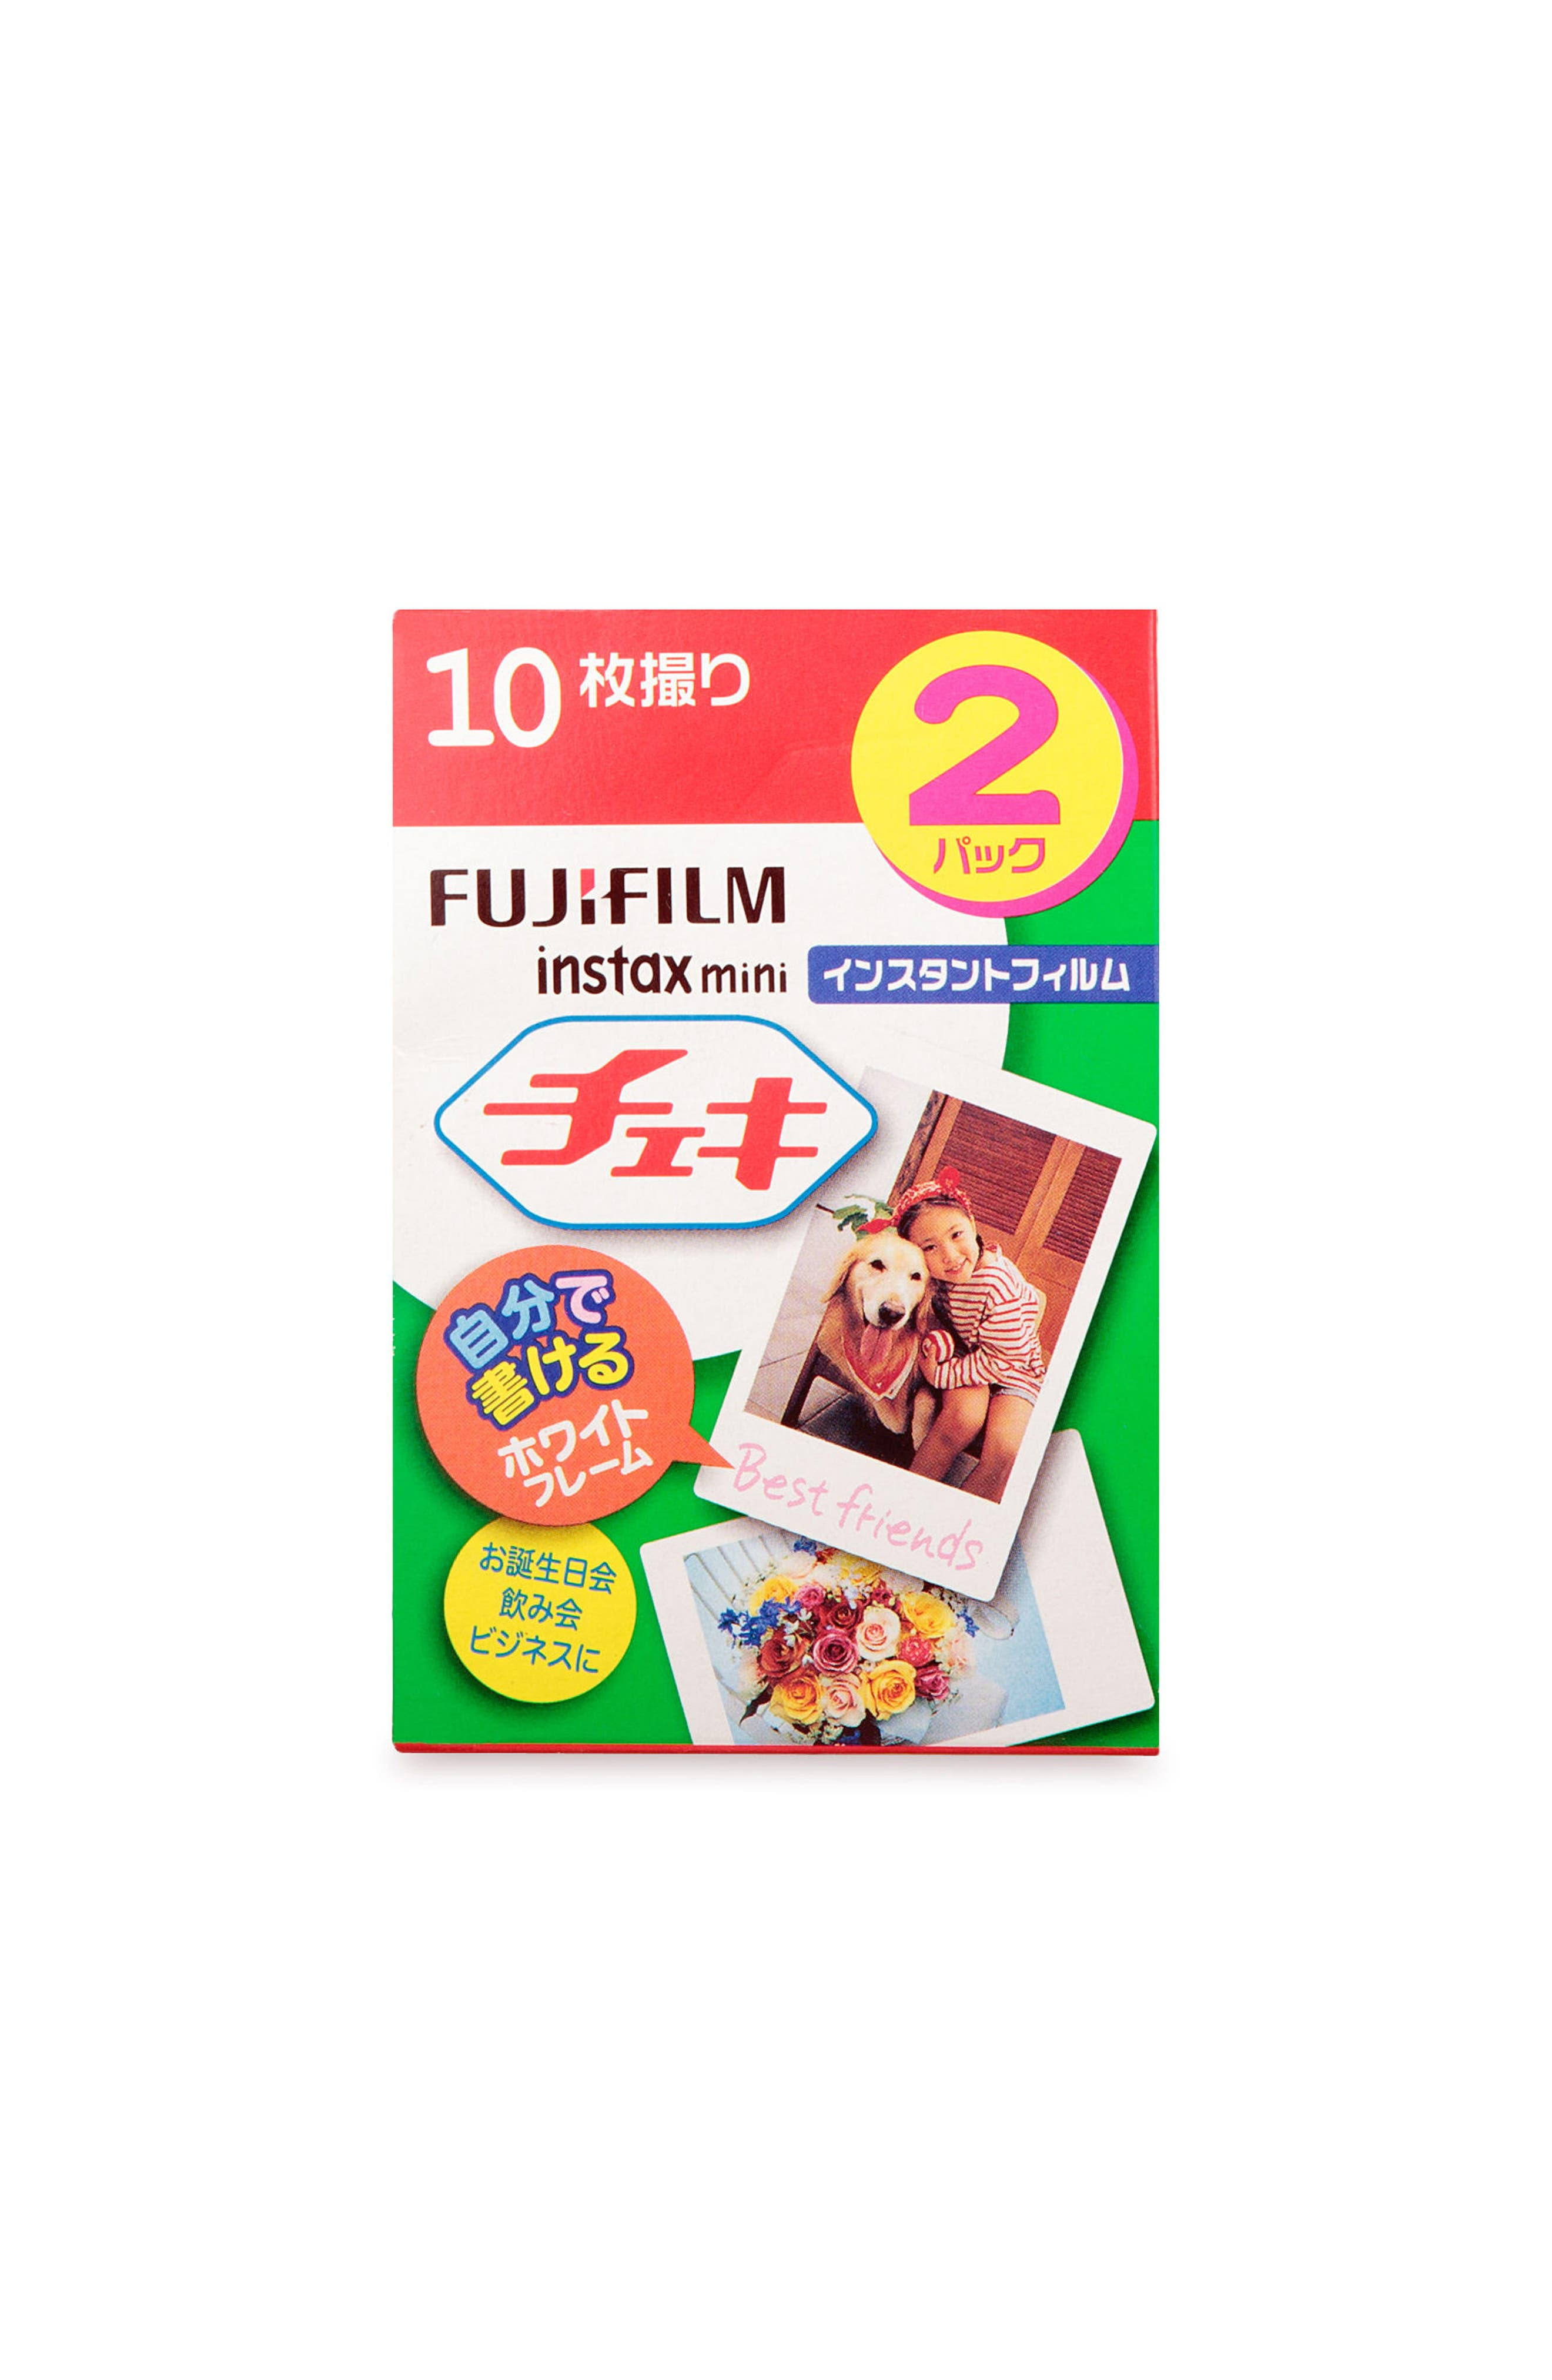 Fujifilm instax mini Double Pack Instant Film